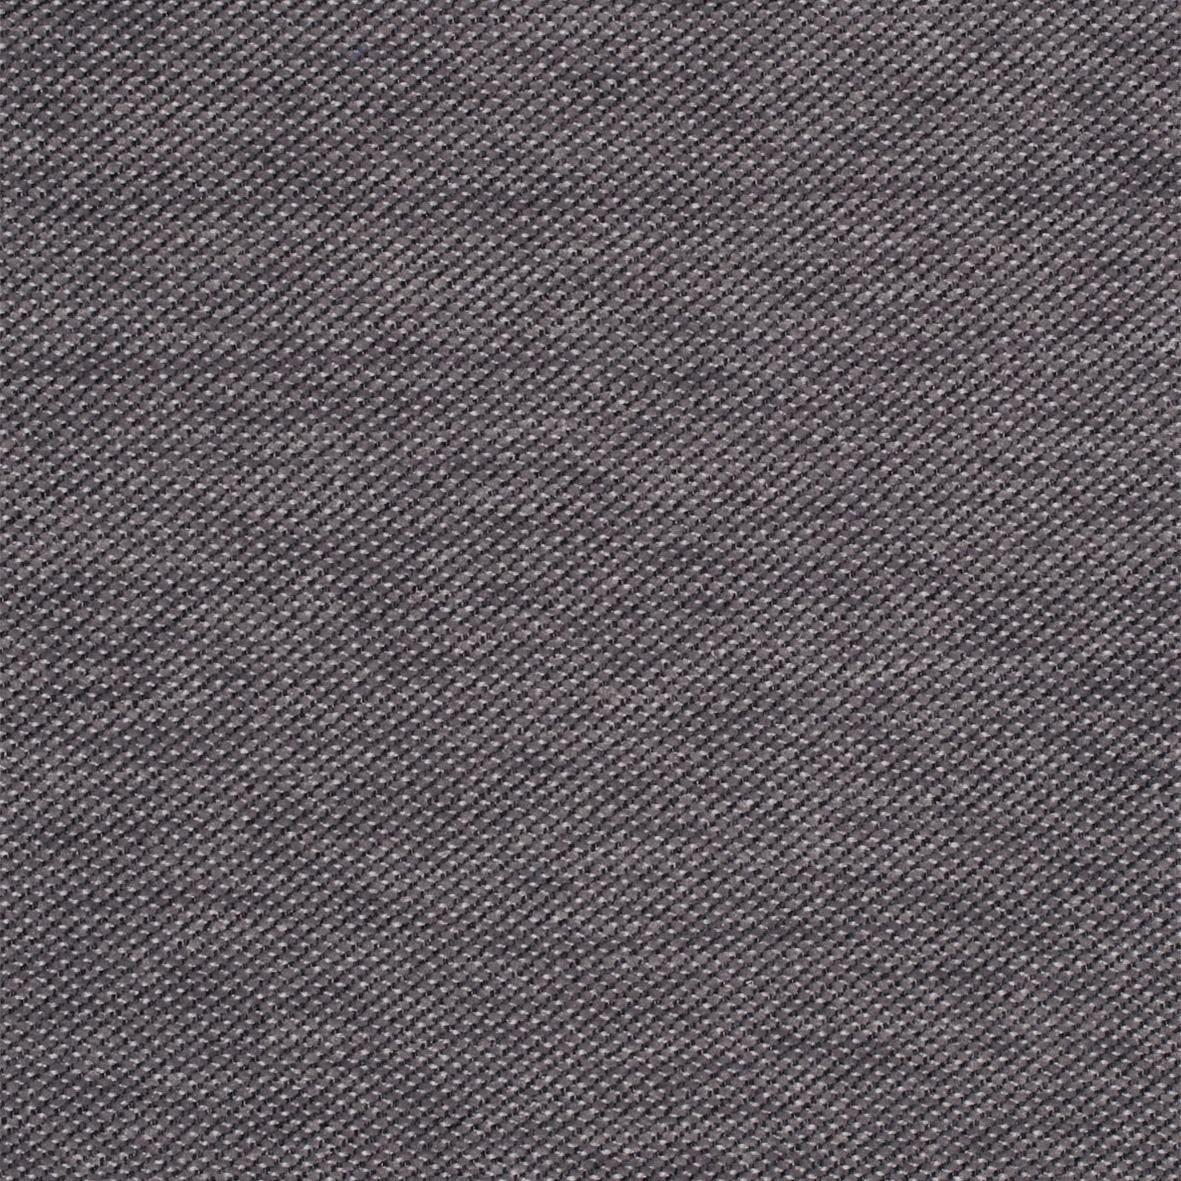 06be846432f Infinity - colour scale   Gabriel.dk